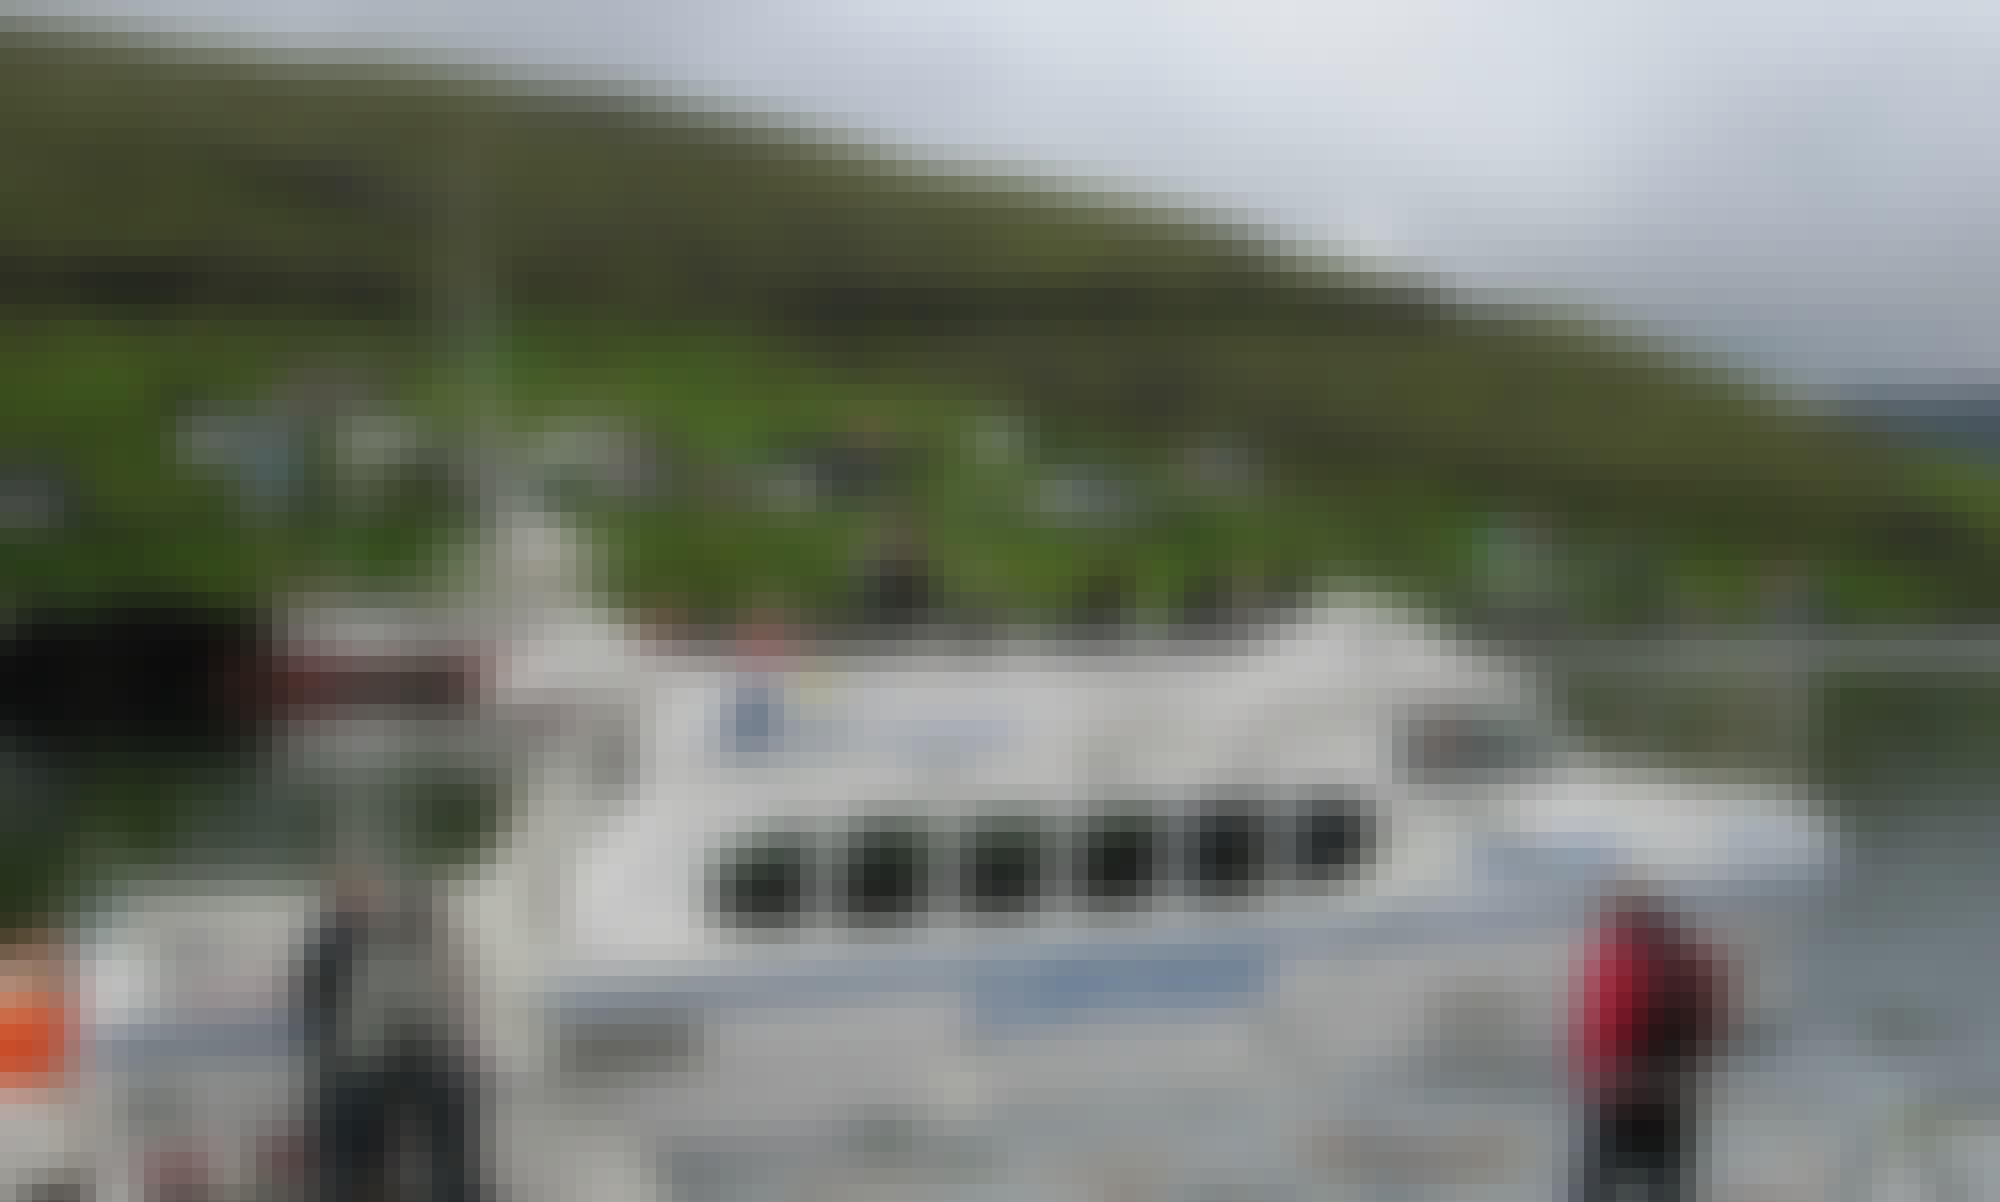 Sightseeing in Vestmanna, Streymoy on Froyur Motor Boat